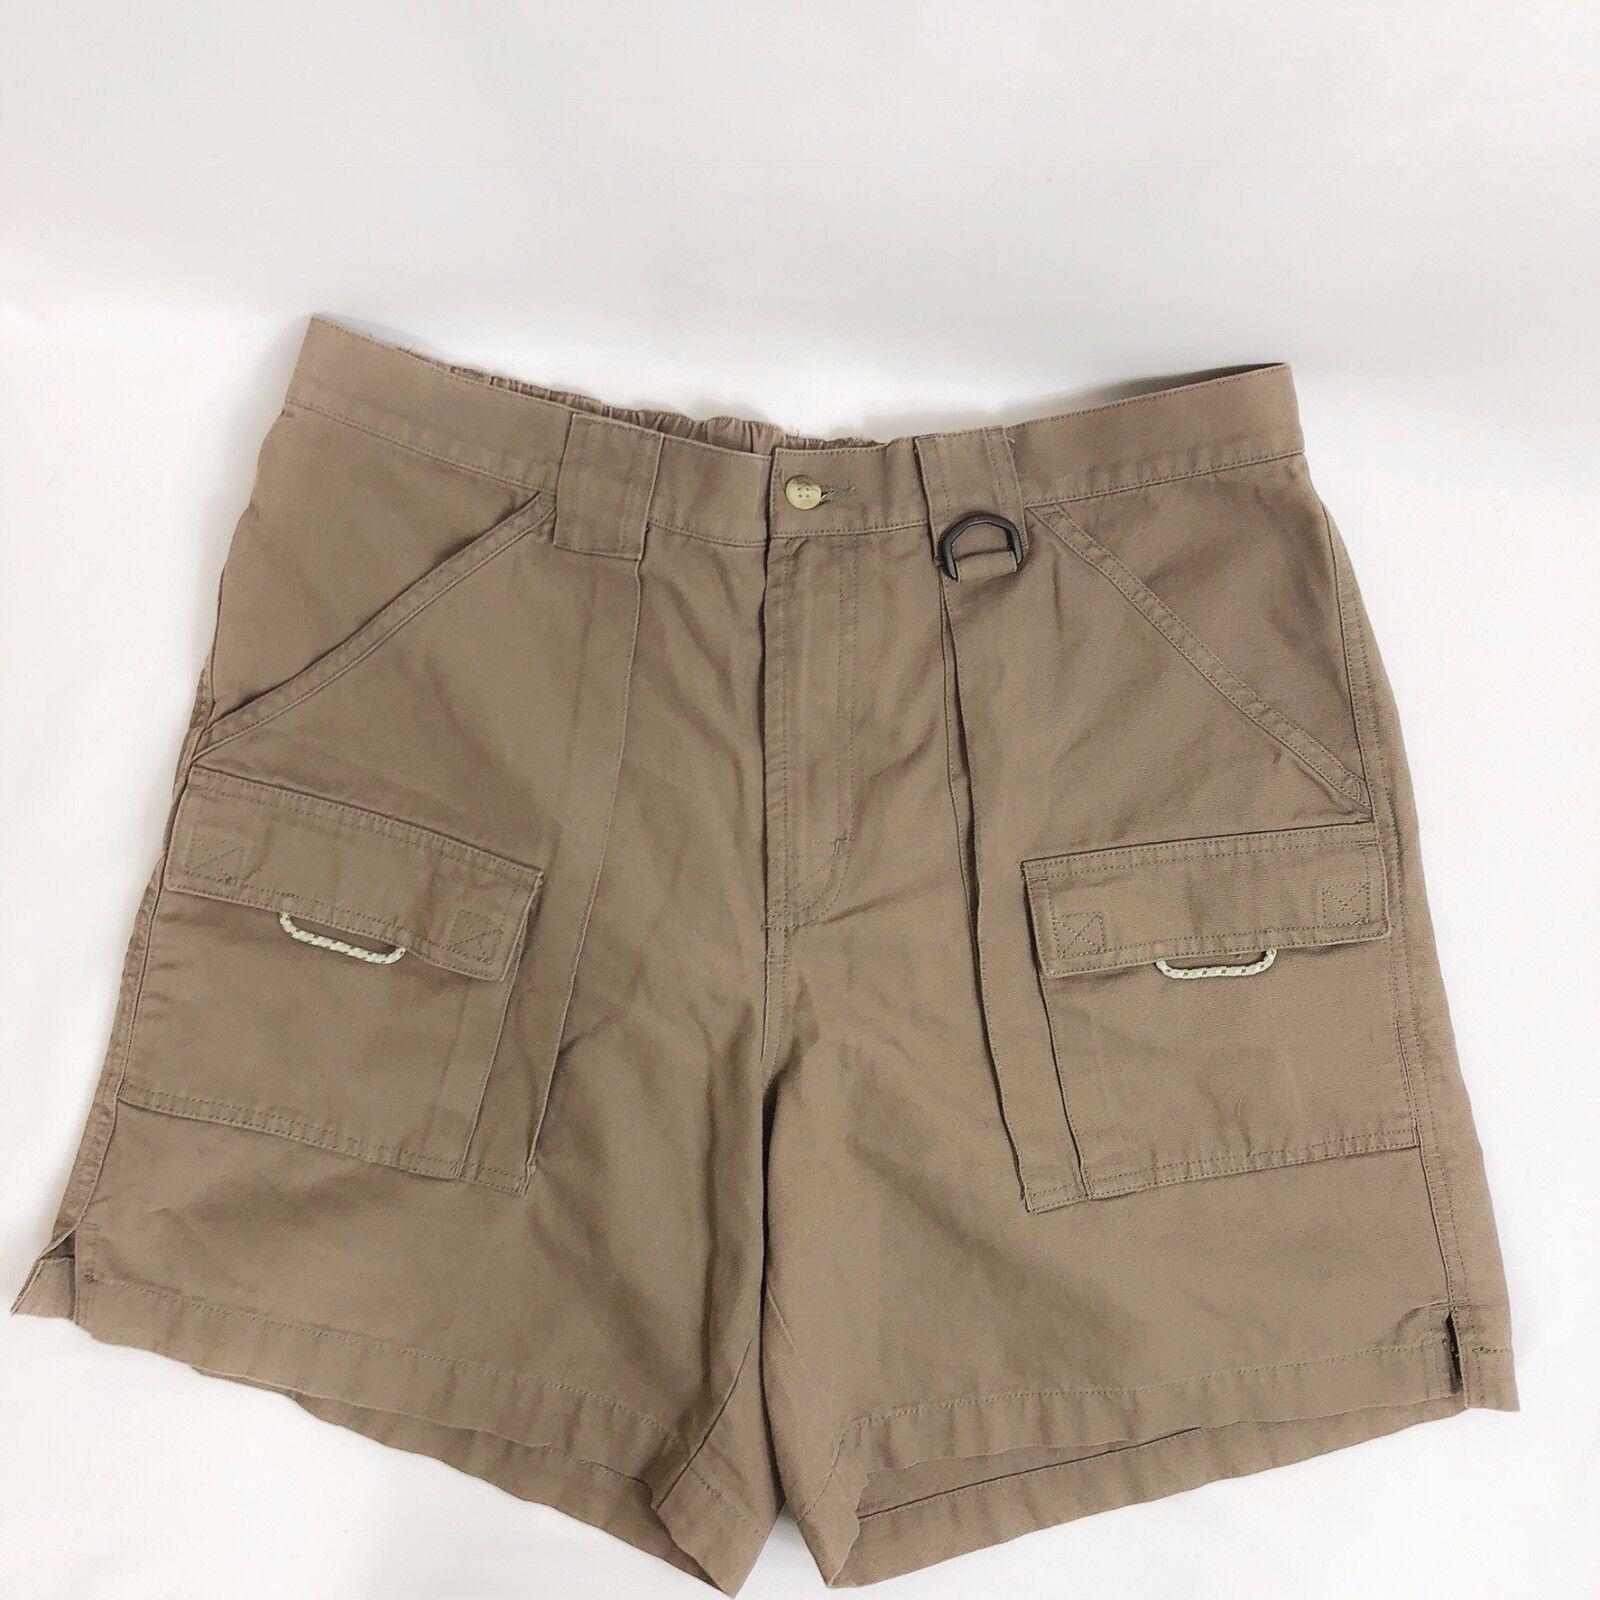 Columbia Performace Fishing Gear Men Large Brown Khaki Cargo Utility Shorts